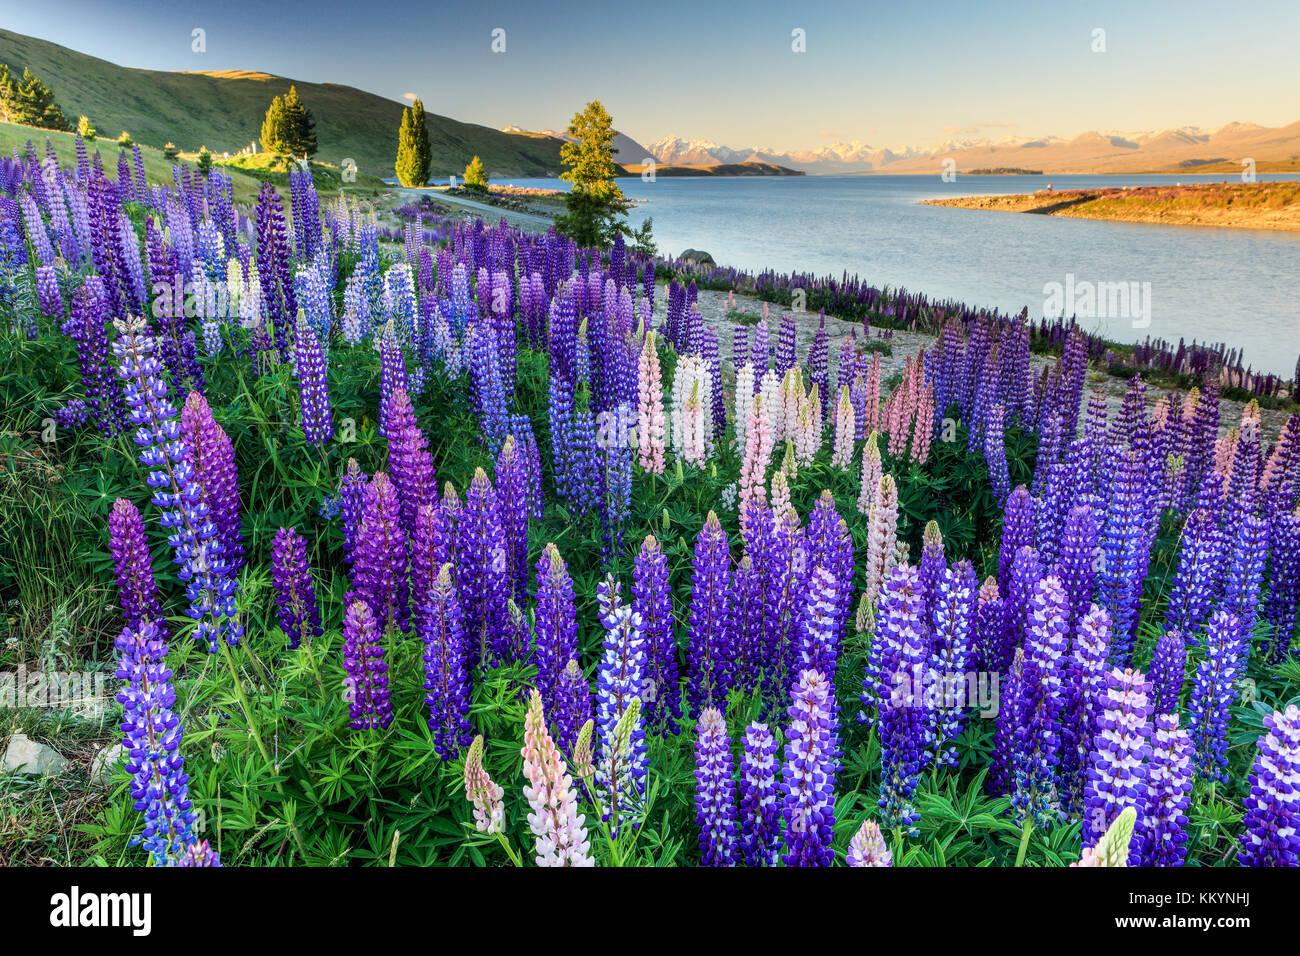 The lupins at Lake Tekapo, Mackenzie Country, New Zealand. Stock Photo